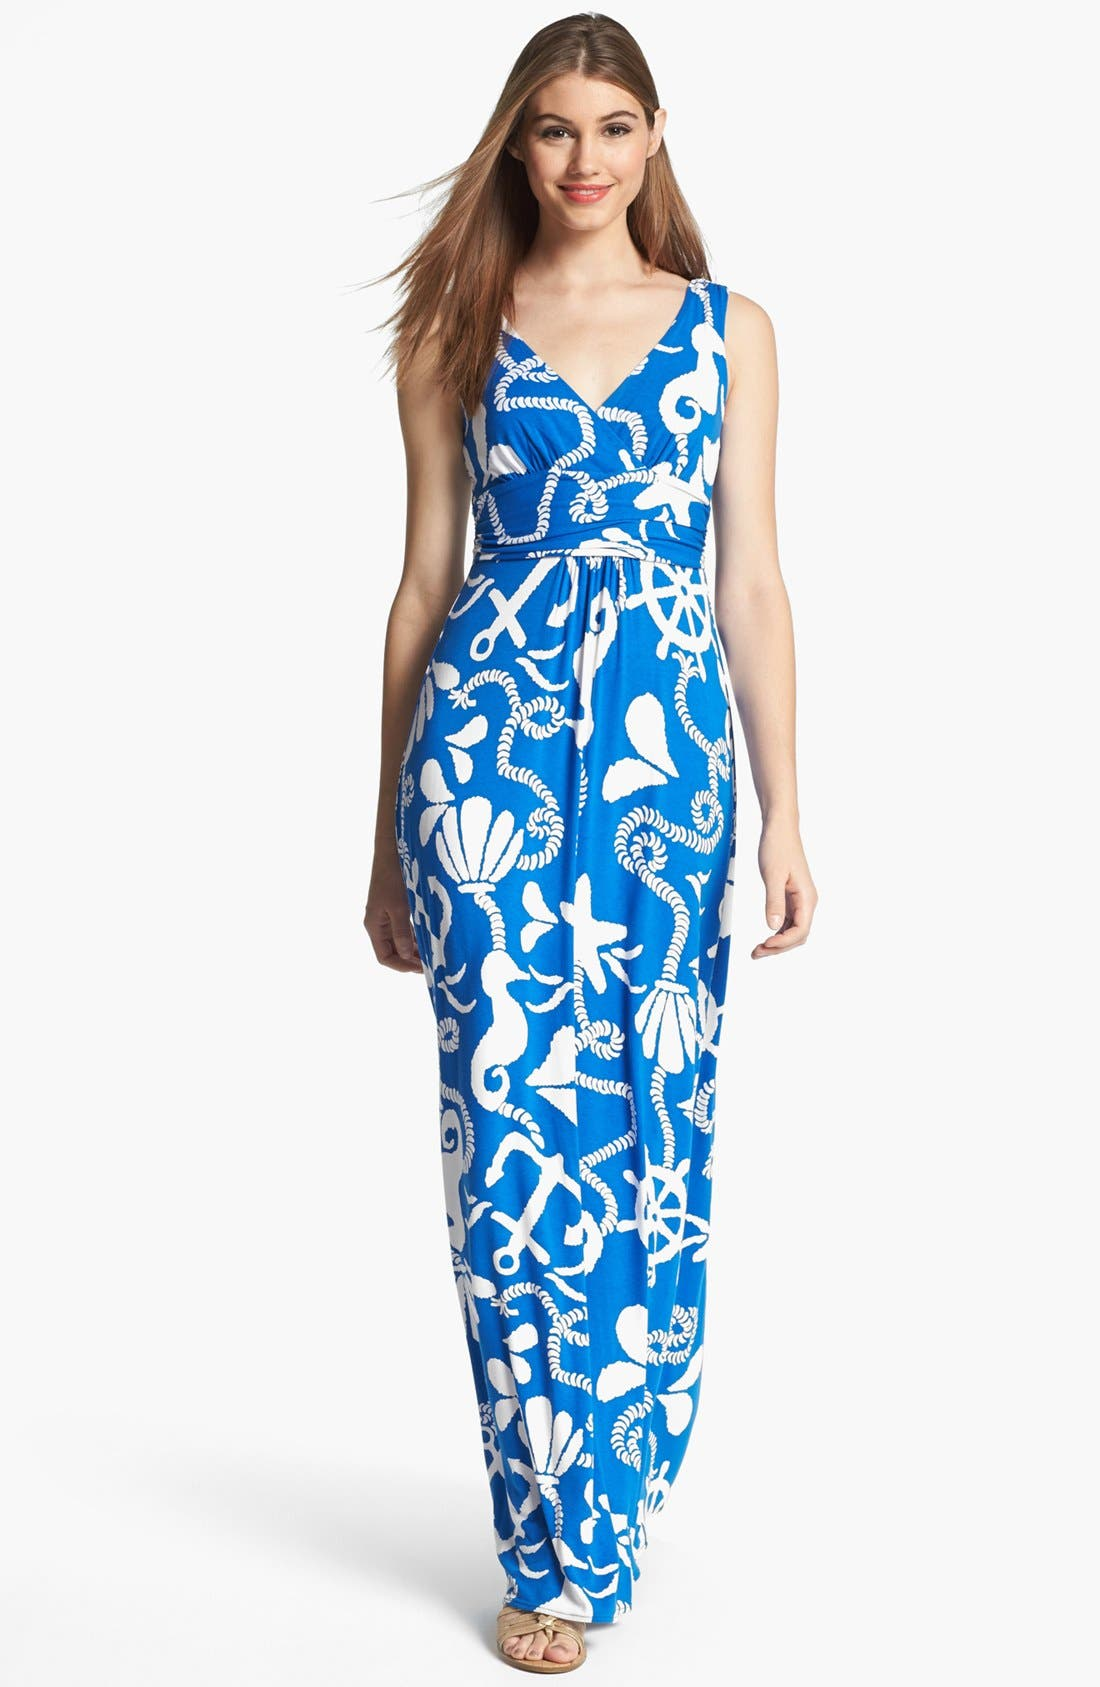 Main Image - Lilly Pulitzer® 'Sloane' Maxi Dress